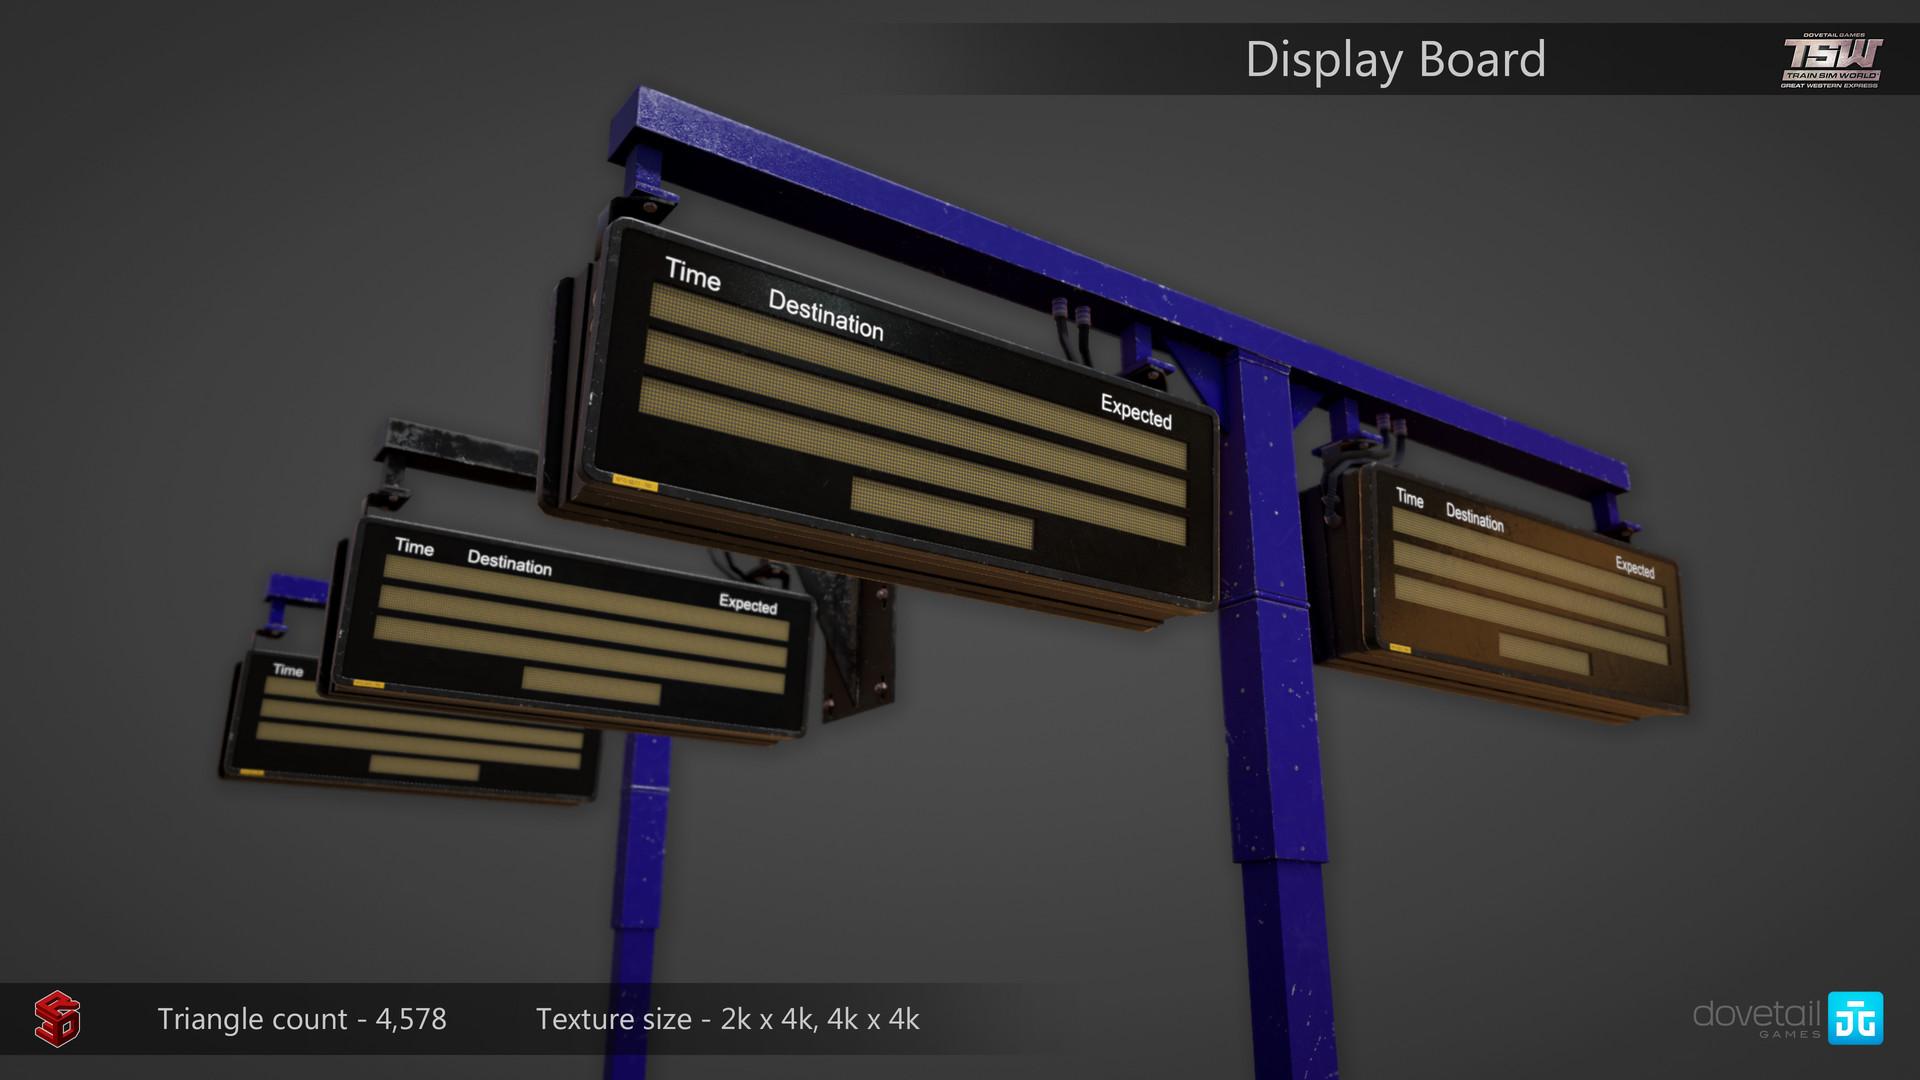 Ross mccafferty displayboard 01